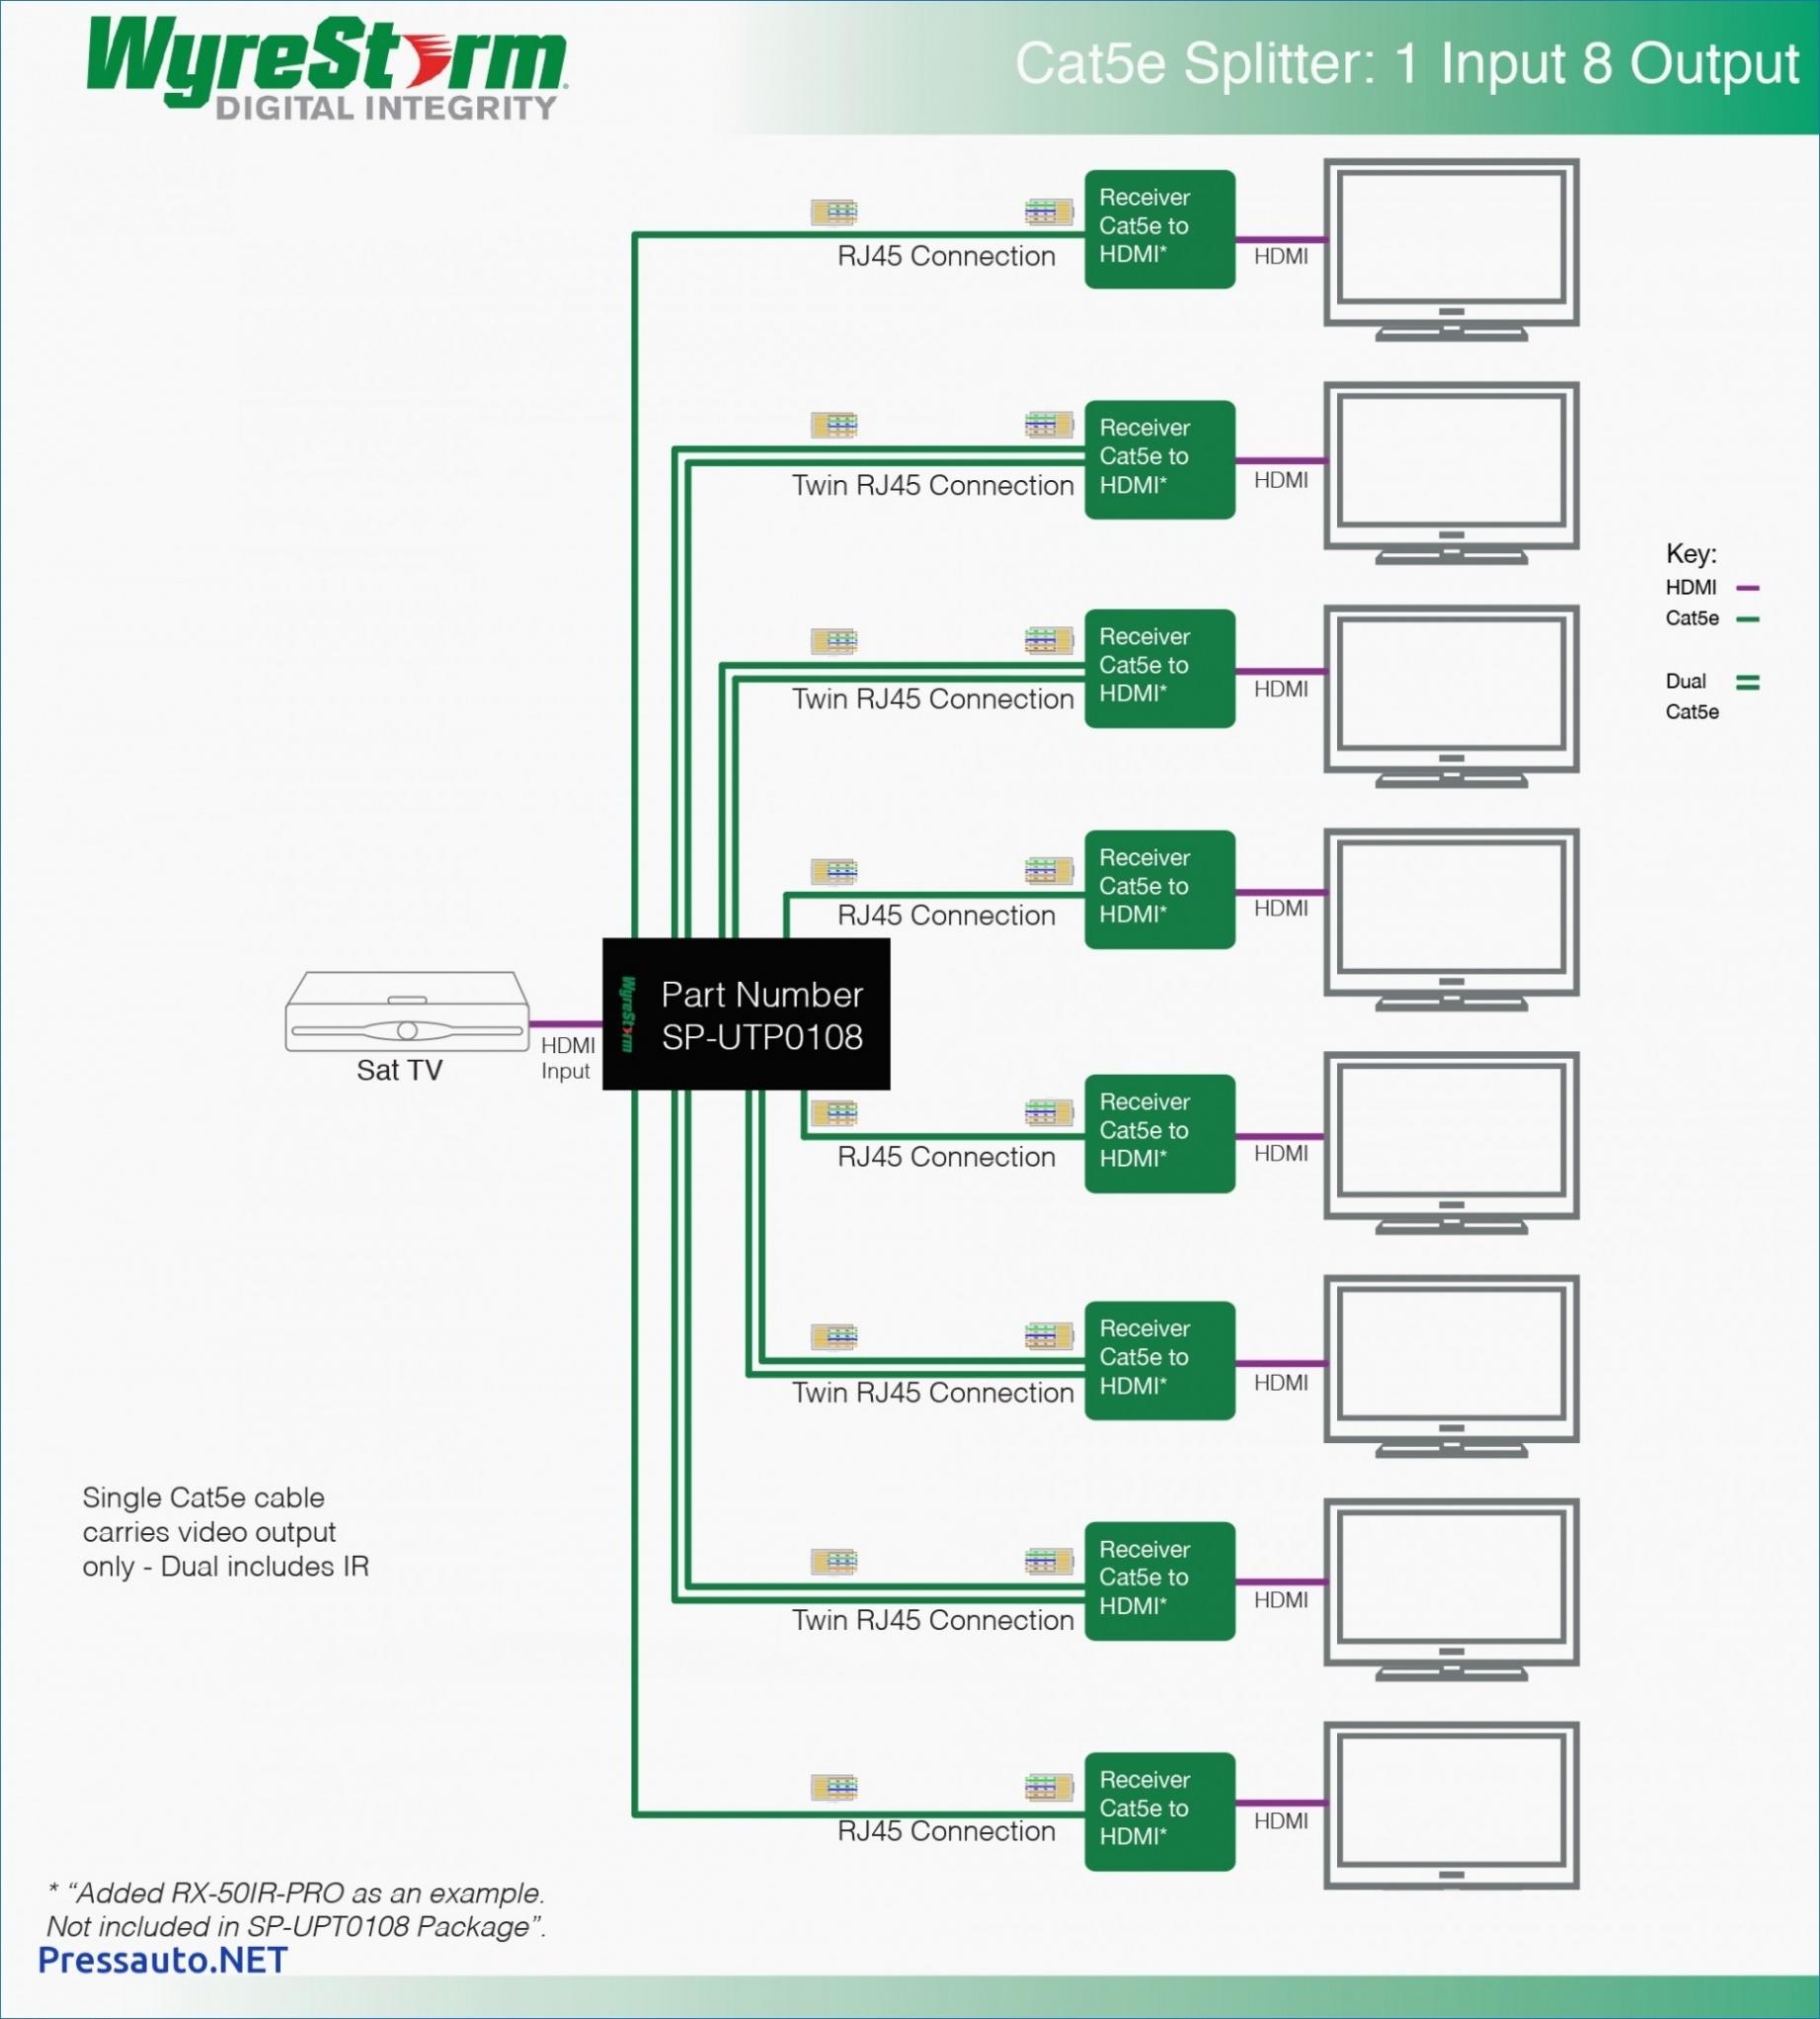 cat6 b wiring diagram 2 zone valve cat 6 free